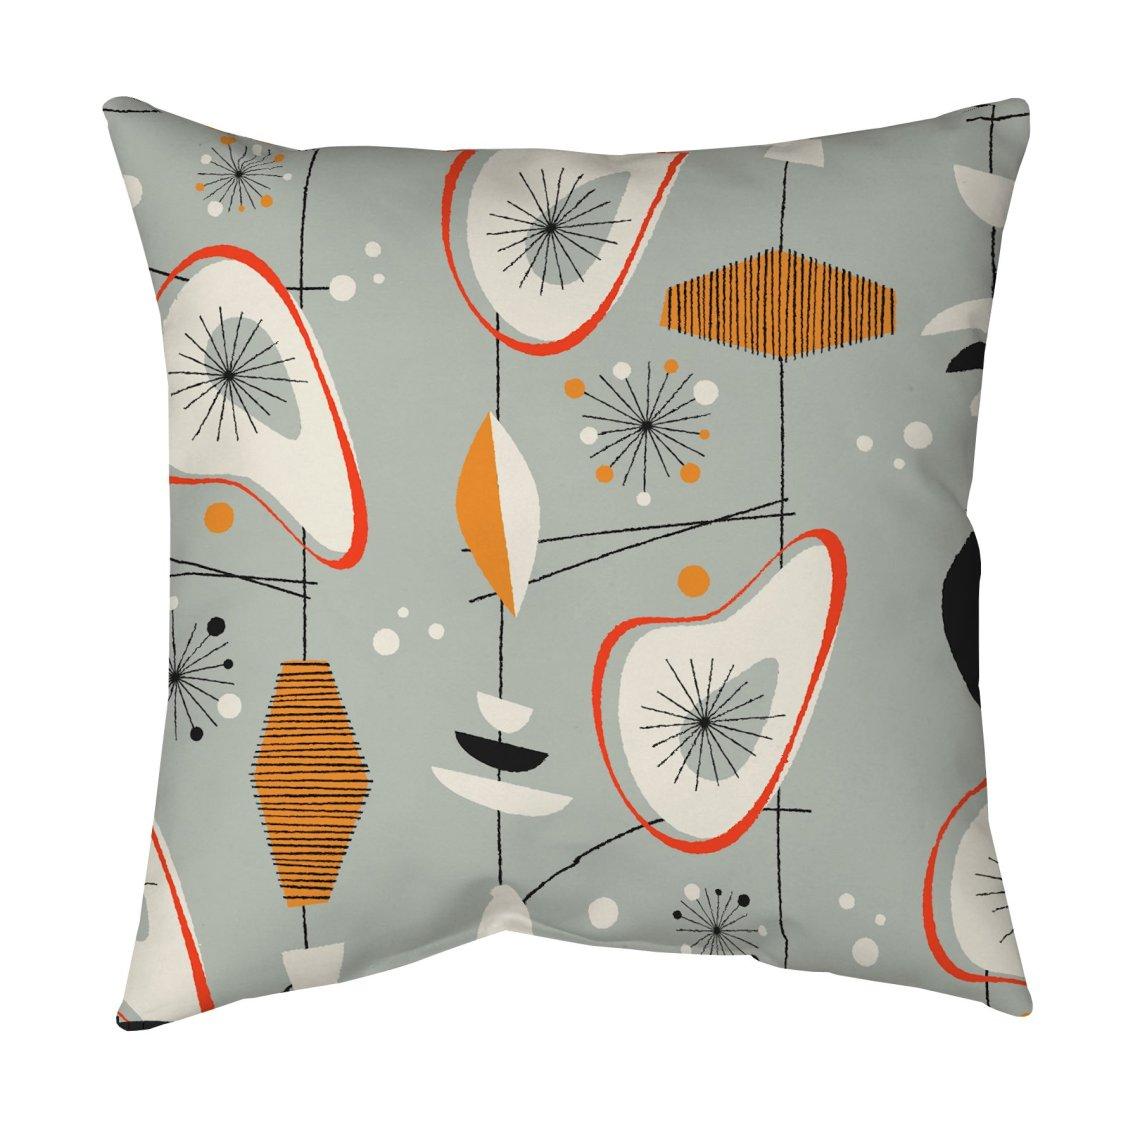 Mid Century Modern Pillow by Blend Home - Twist Modern